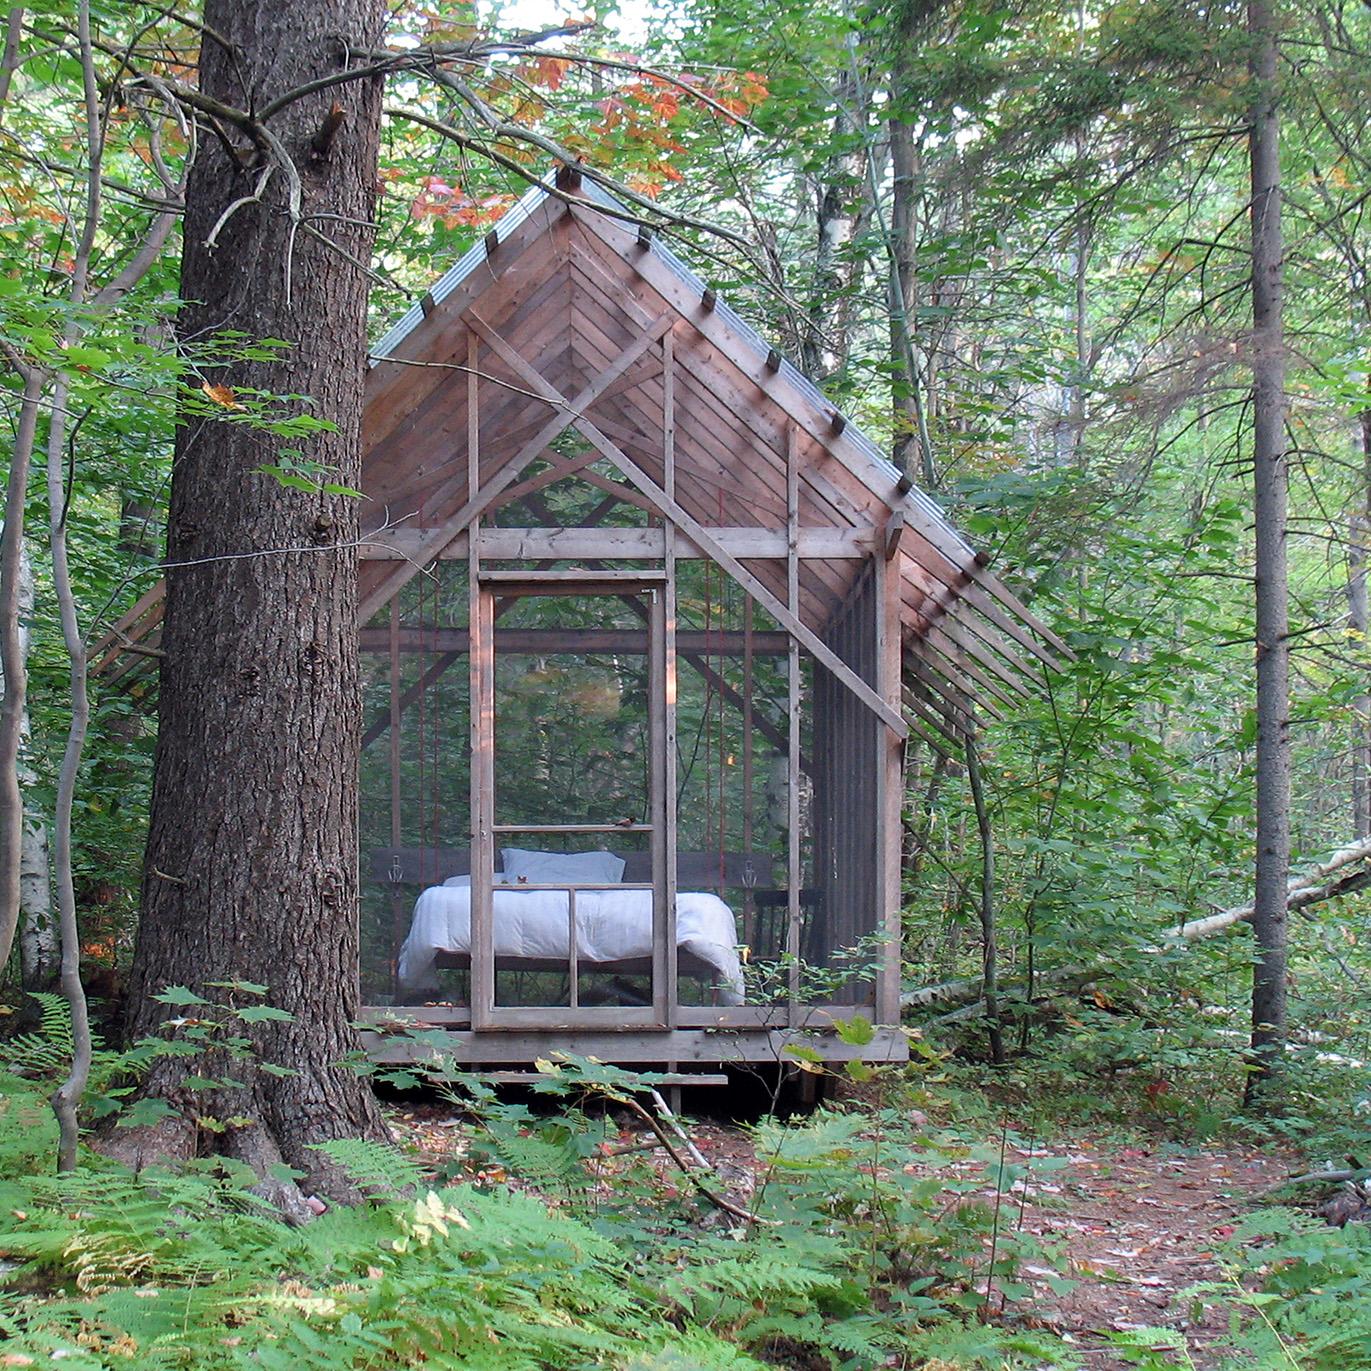 Fernhouse - Woodland Napping Folly